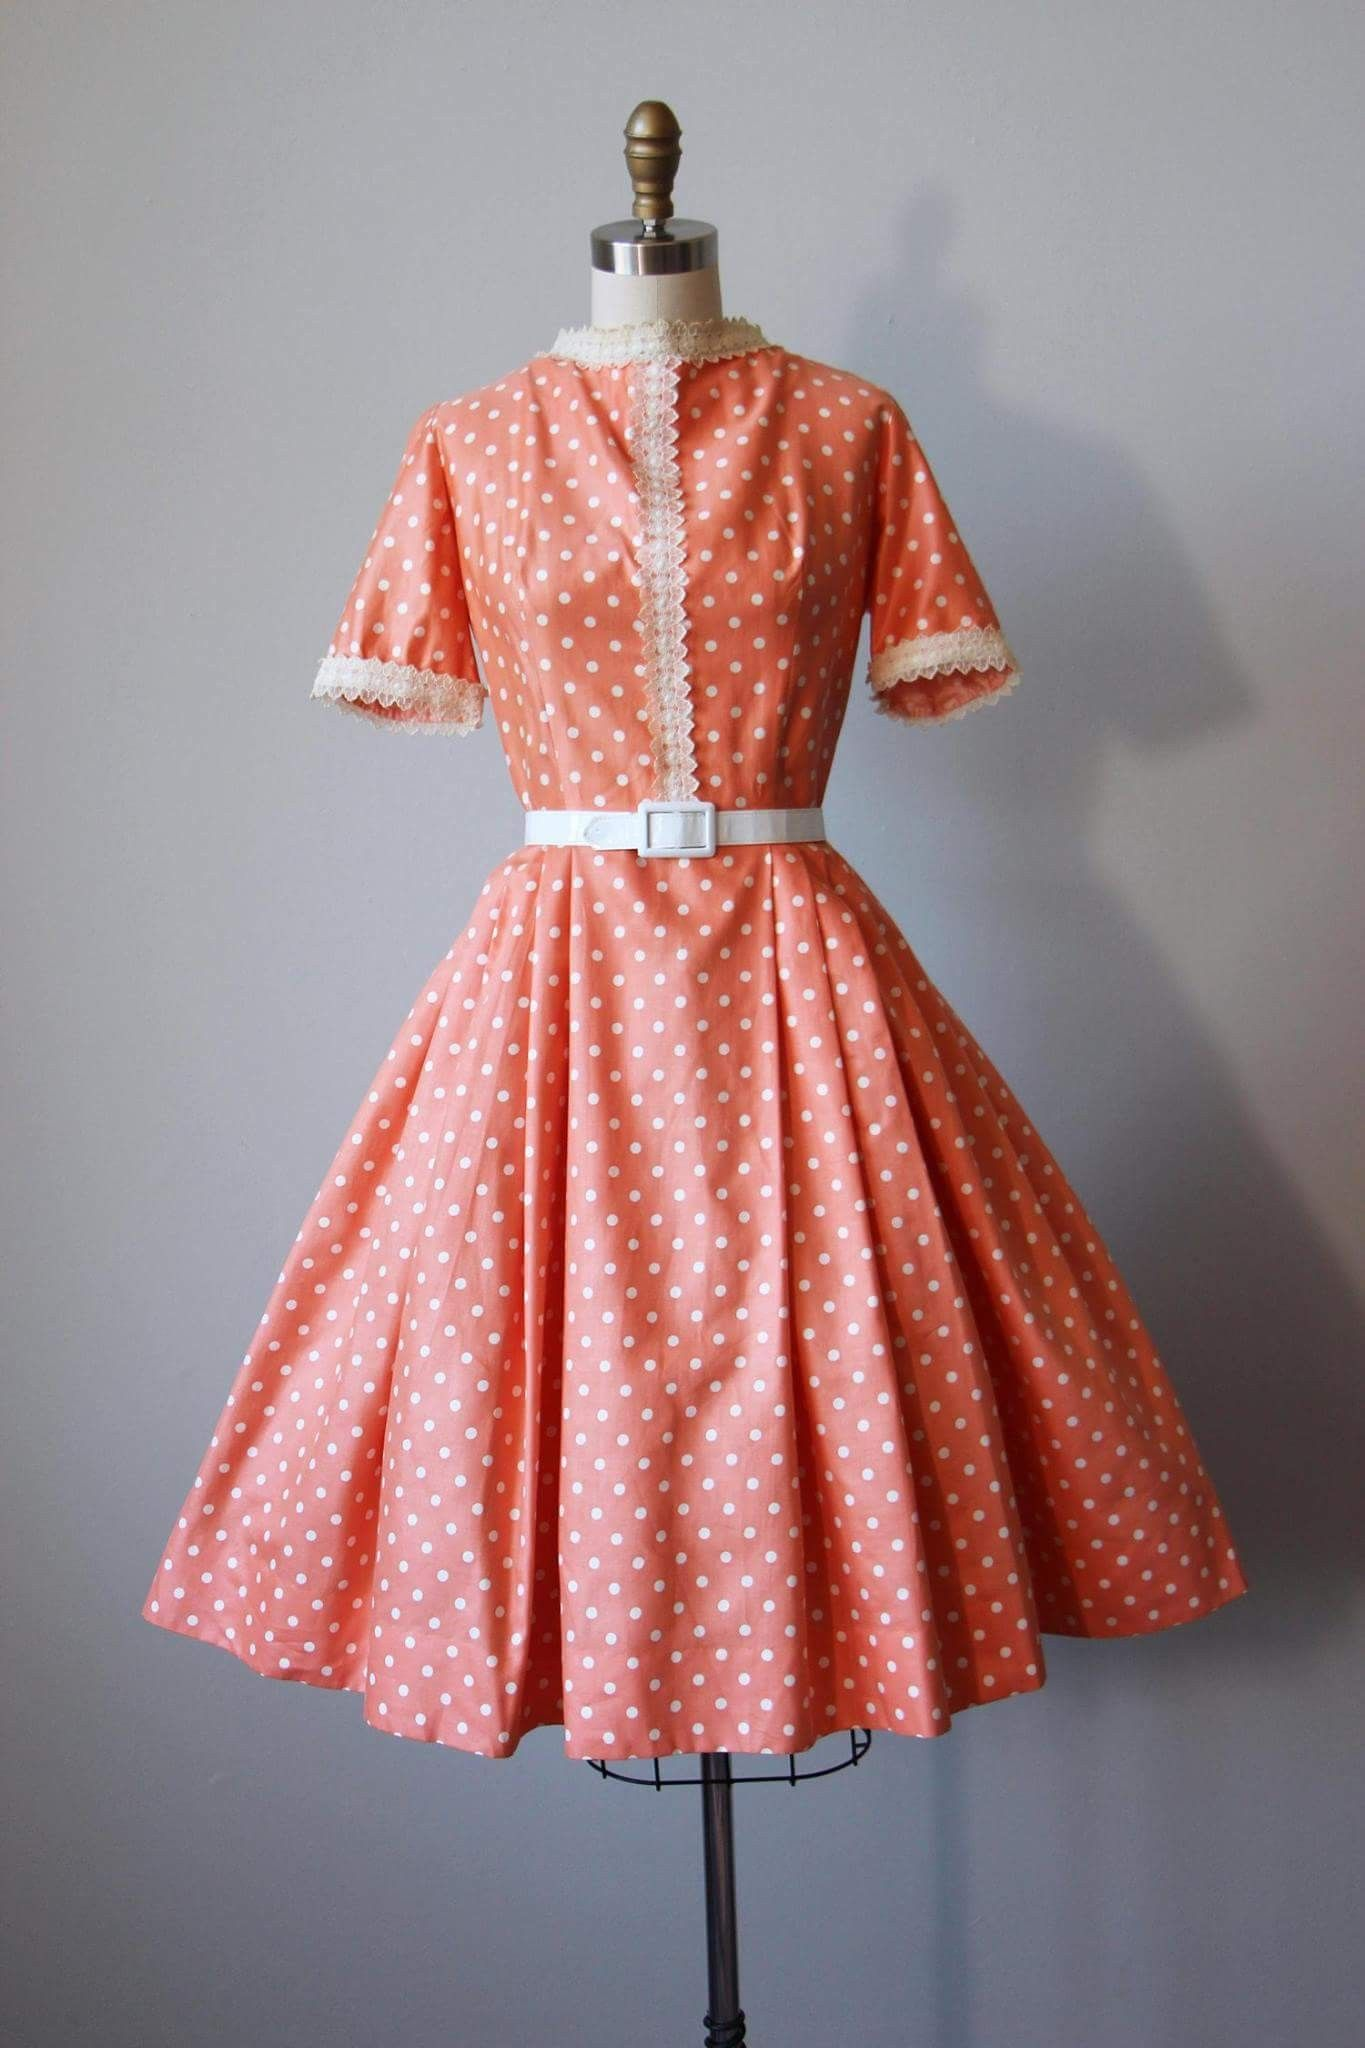 Pin de Leona Holloway en sew sew for grown-ups | Pinterest ...